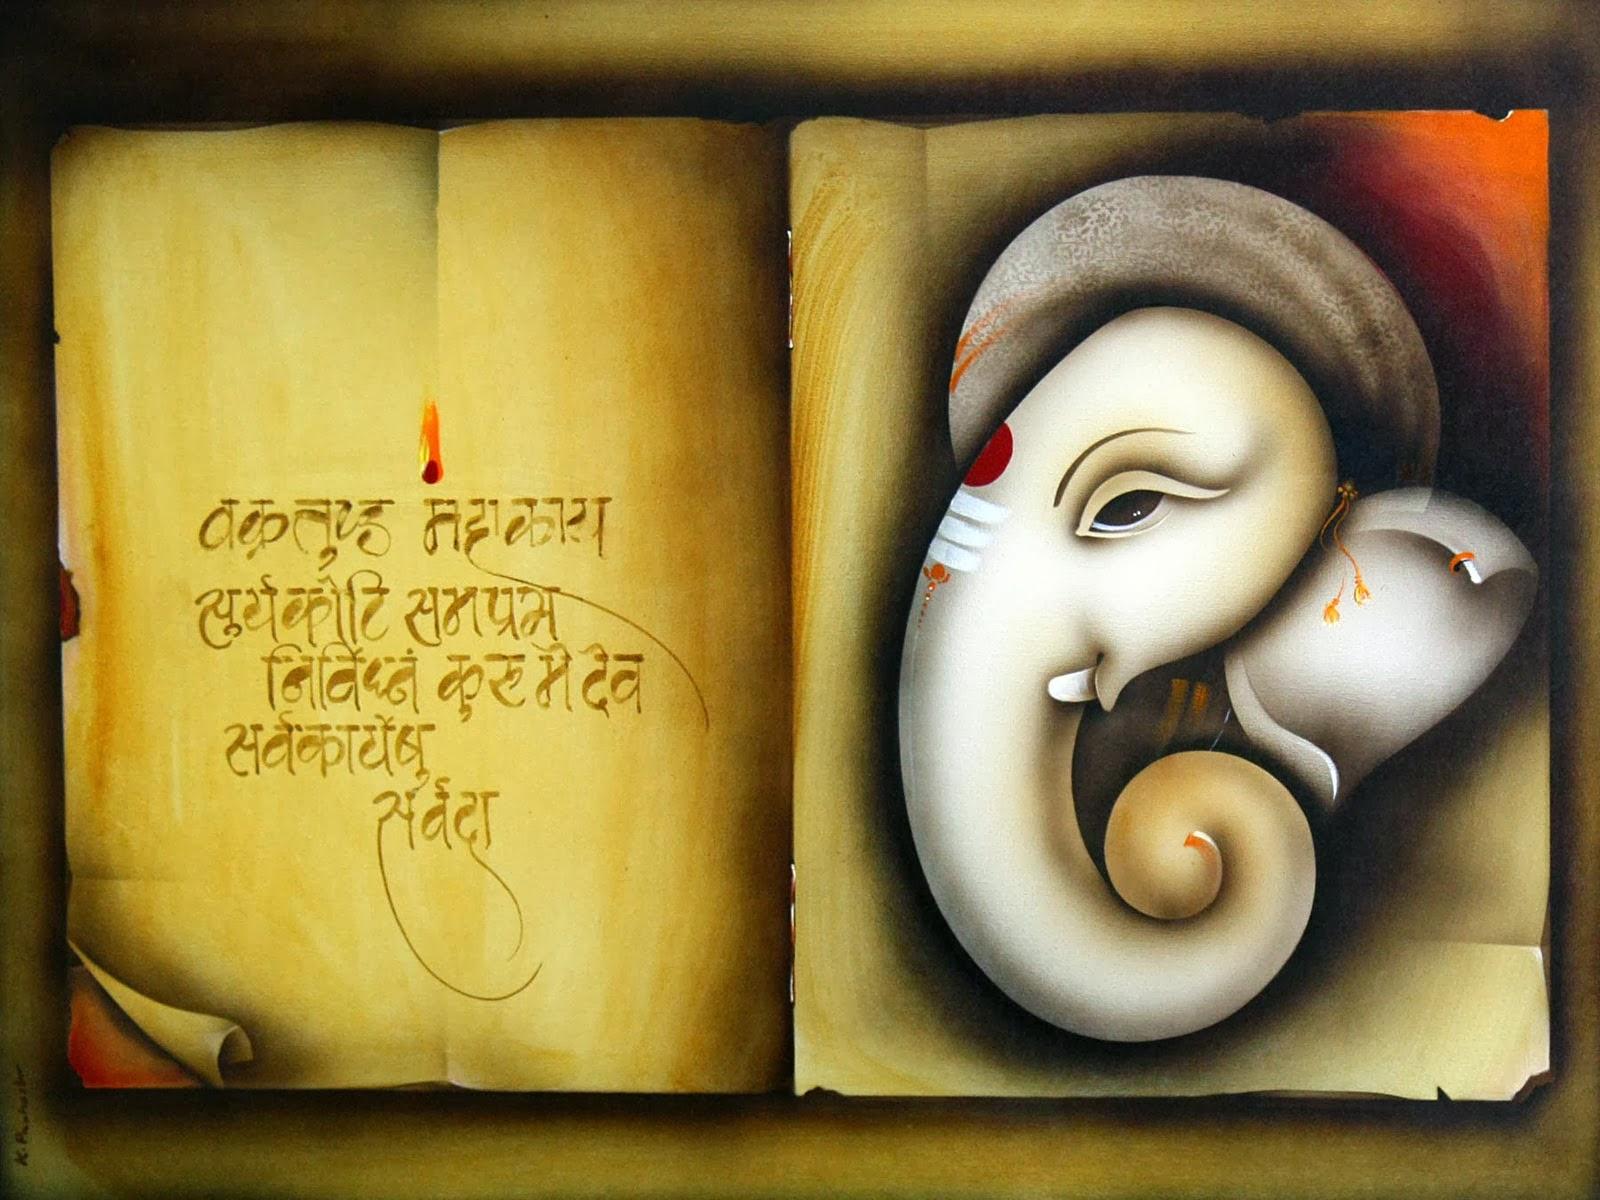 Sai Baba Animated Wallpapers Free Download Hindu Mantra Wallpapers Hindu God Wallpaper